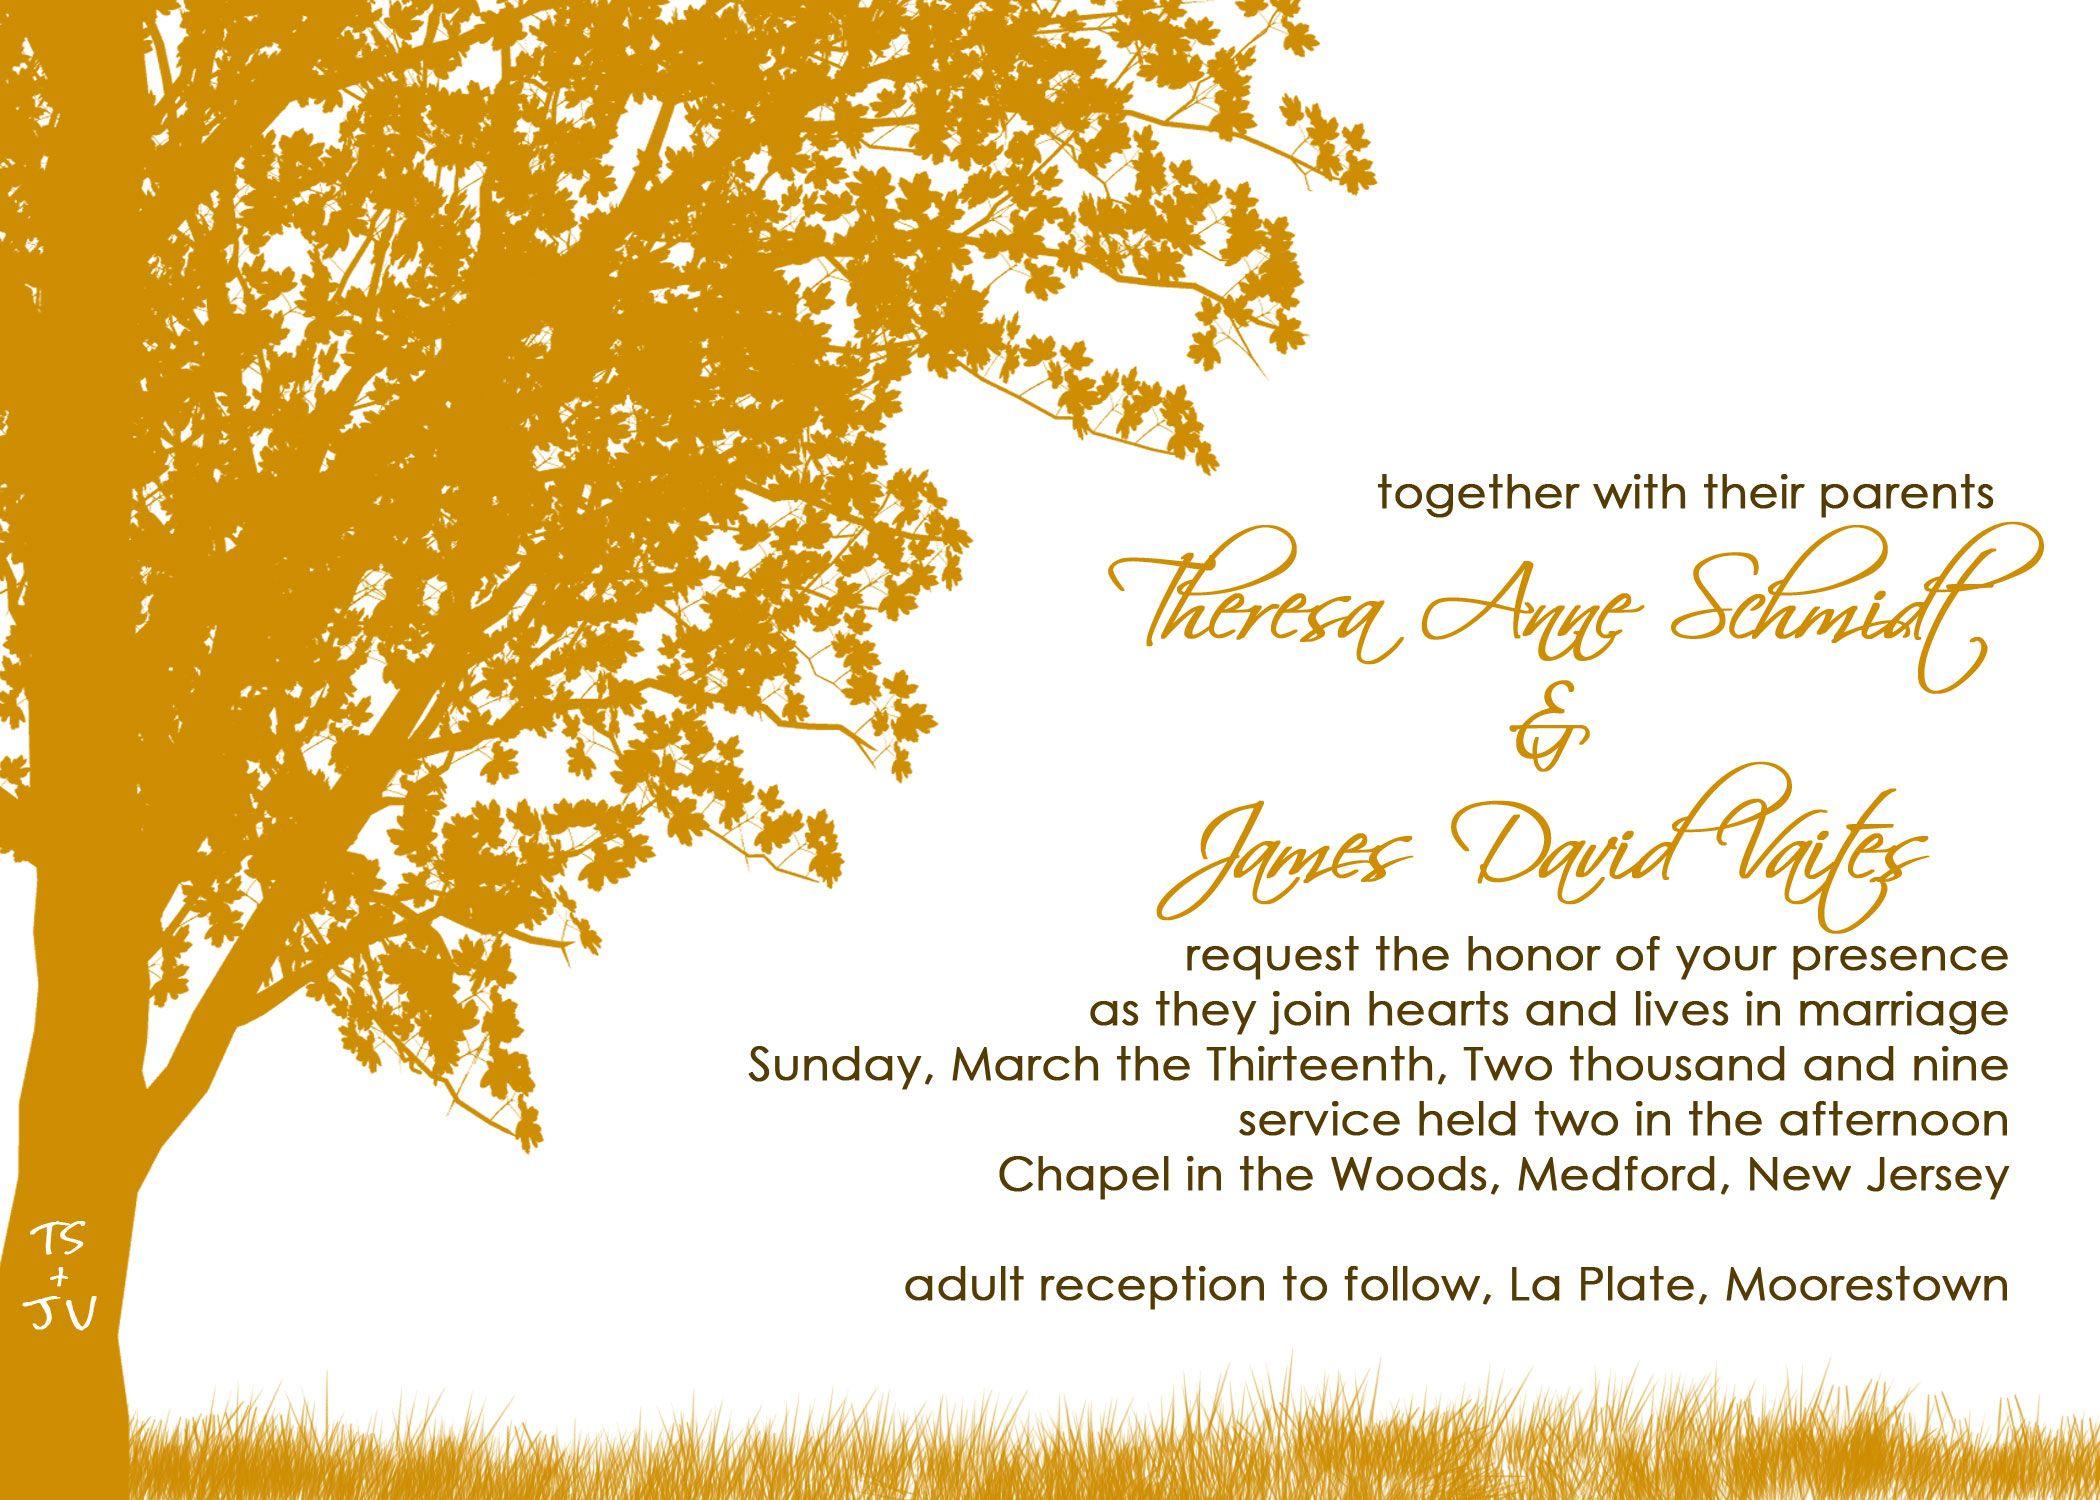 customizable wedding invitations Wedding invitations at uniquely u designs wedding planning ideas Wedding invitations at uniquely u designs wedding planning ideas